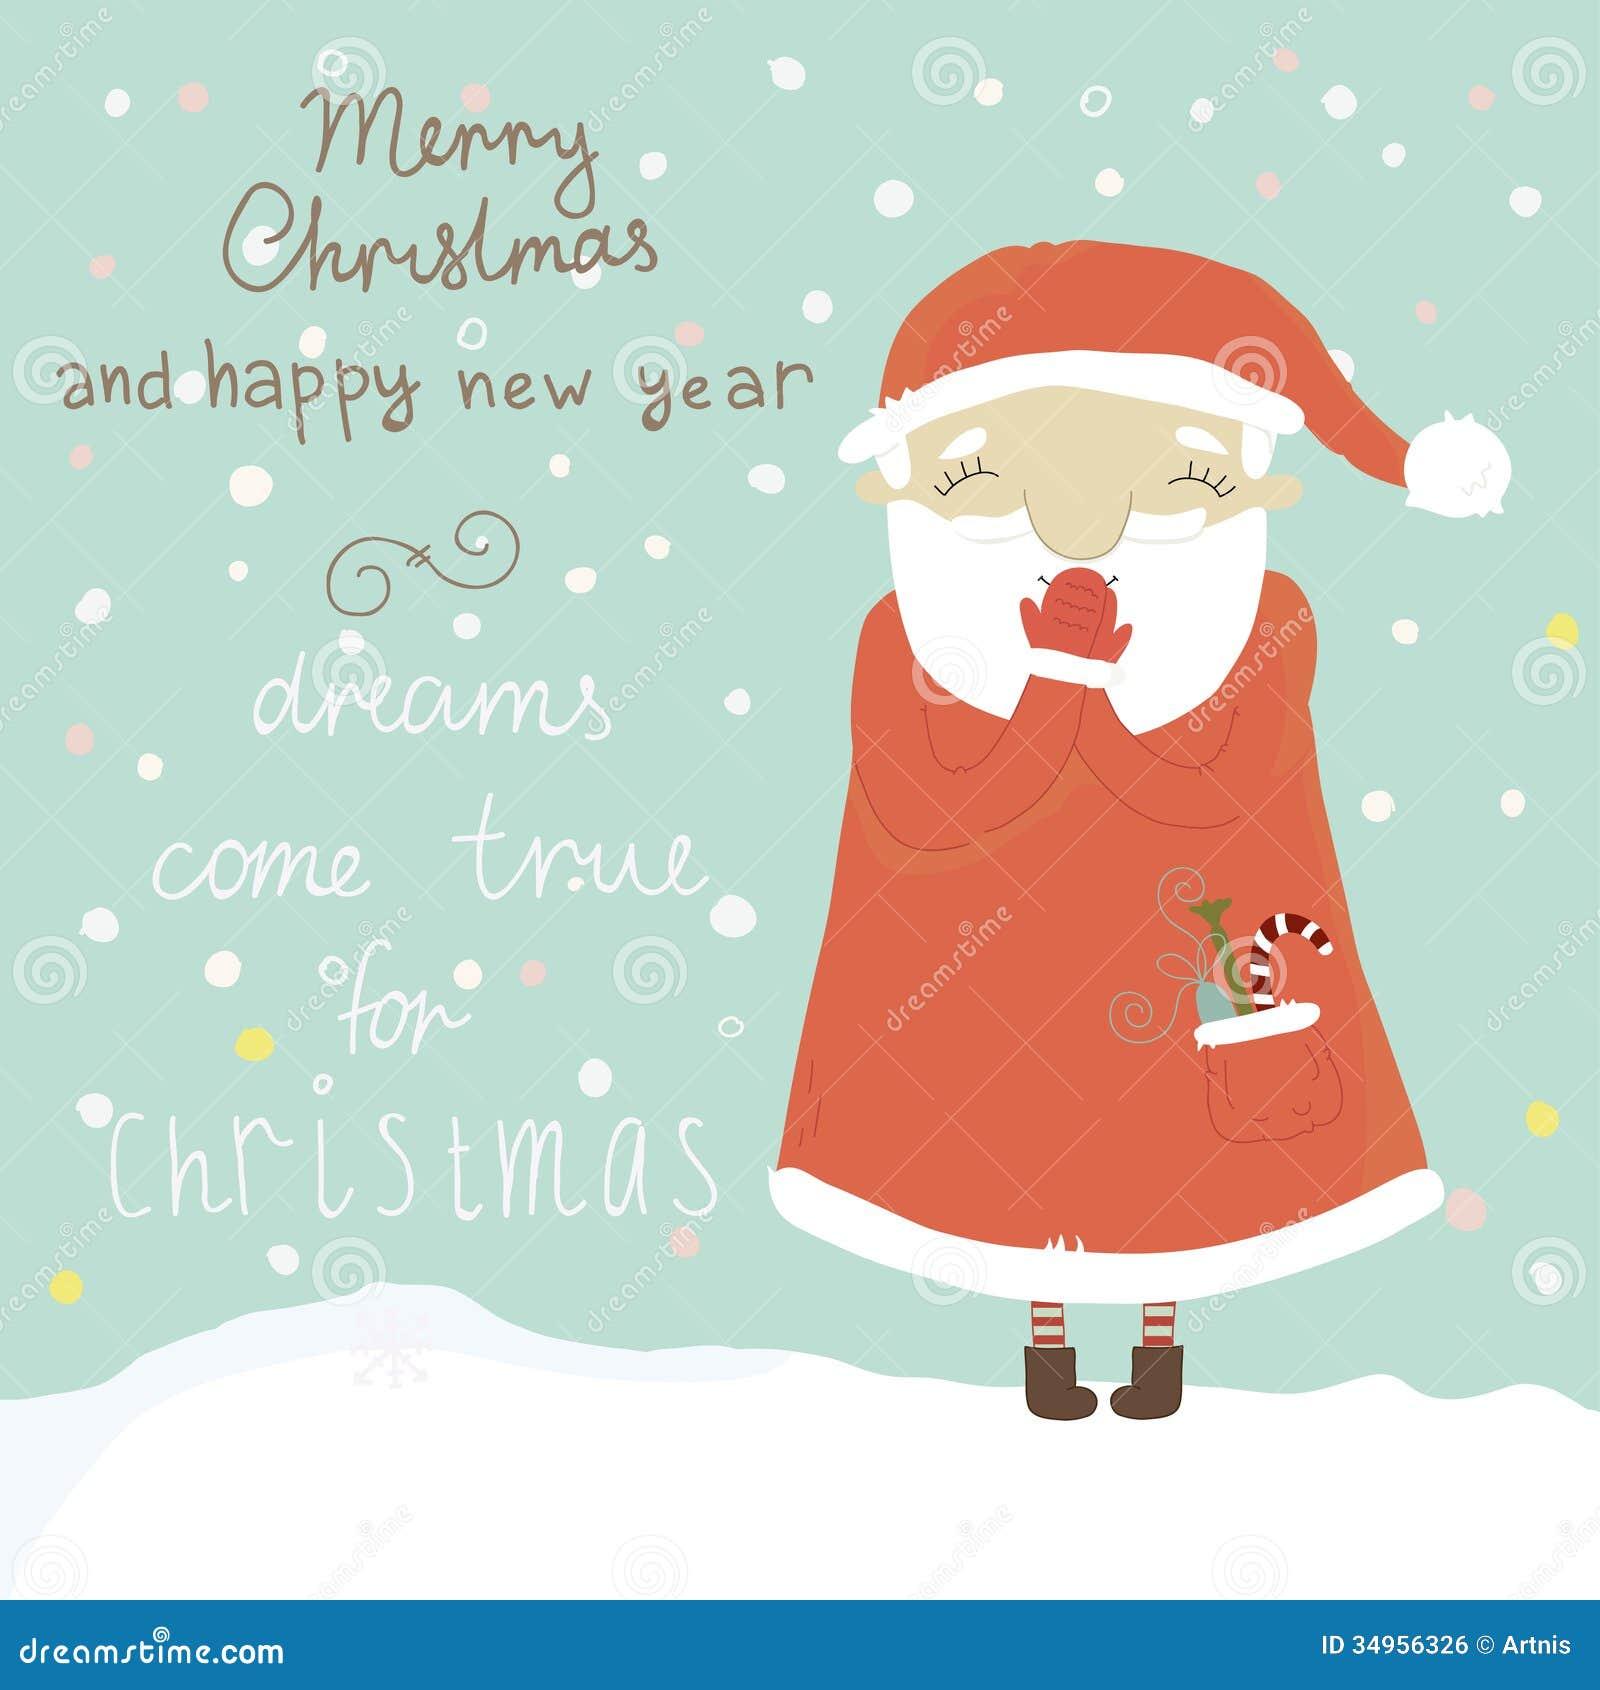 Christmas Greeting Card With Santa Claus Royalty Free